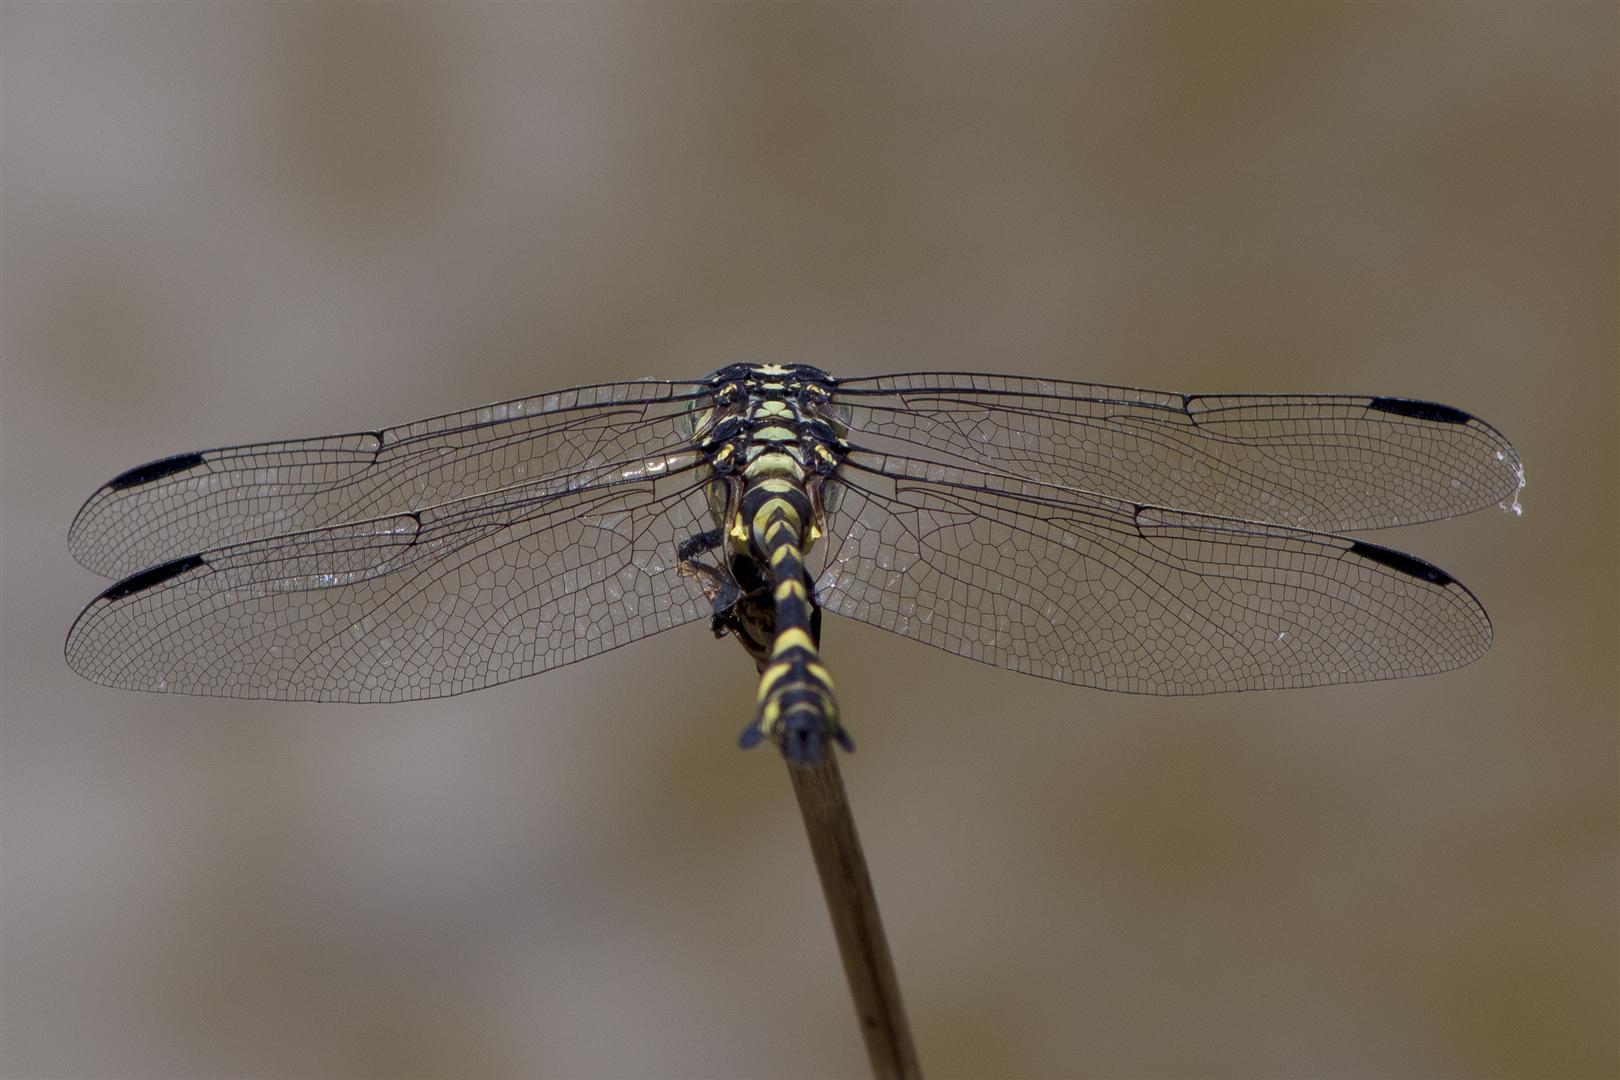 Dragonfly trip with Rod Hosbon, Al Young, Mark Weaver and Harry Ashdown. Murphys Bridge, Lockyer Creek. Australian Tiger, Ictinogomphus australis.